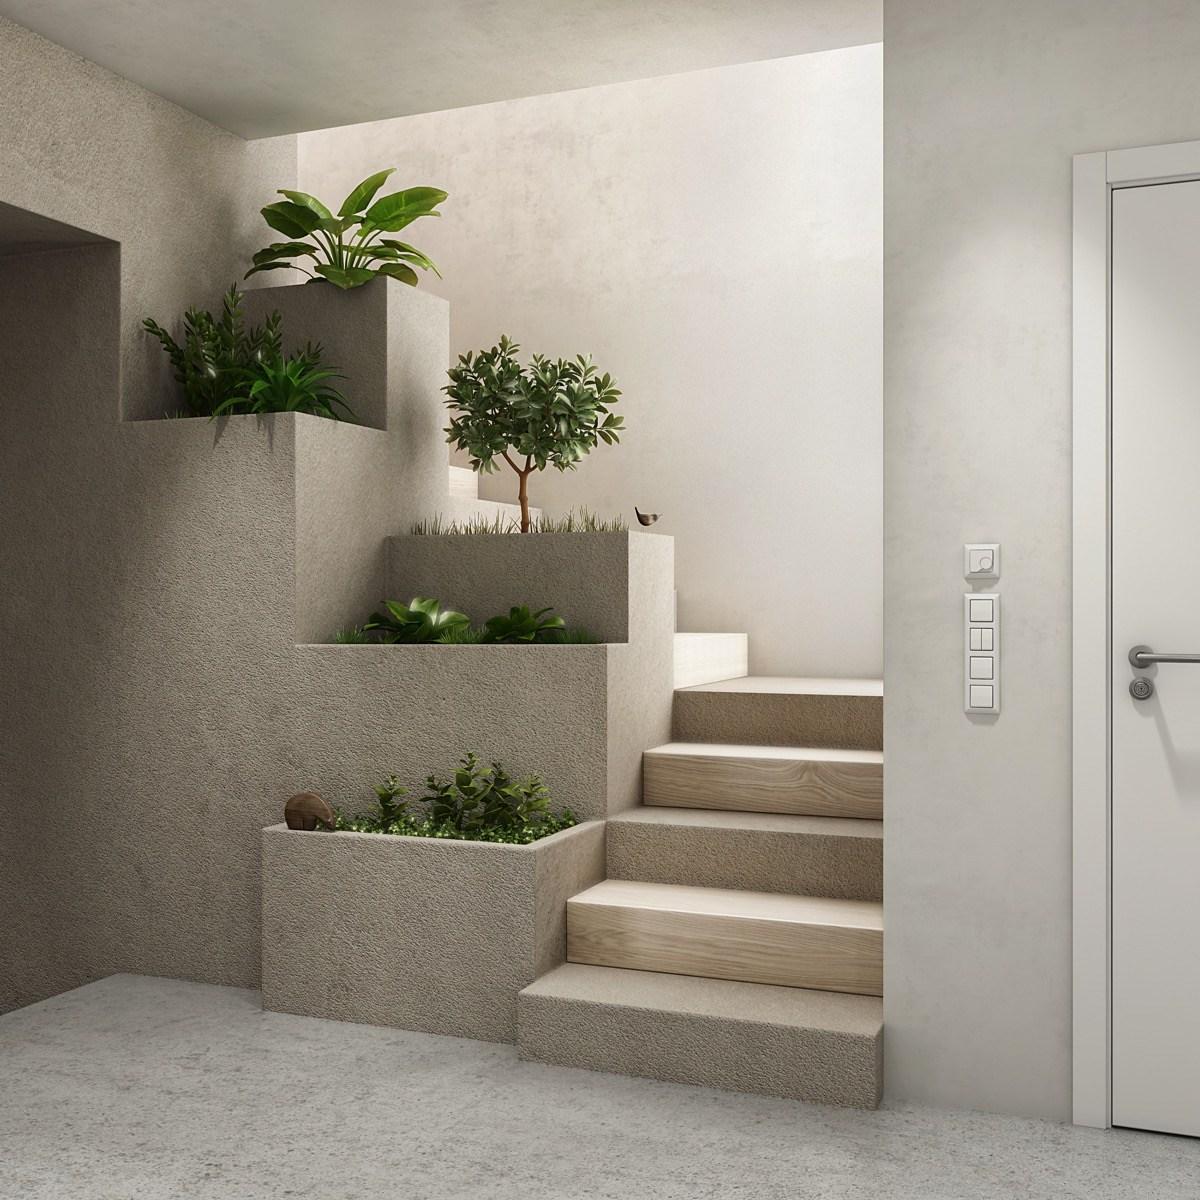 51 Stunning Staircase Design Ideas | 2 Stairs House Design | Interior | Dream House | Box Type | Basic | Ultra Modern